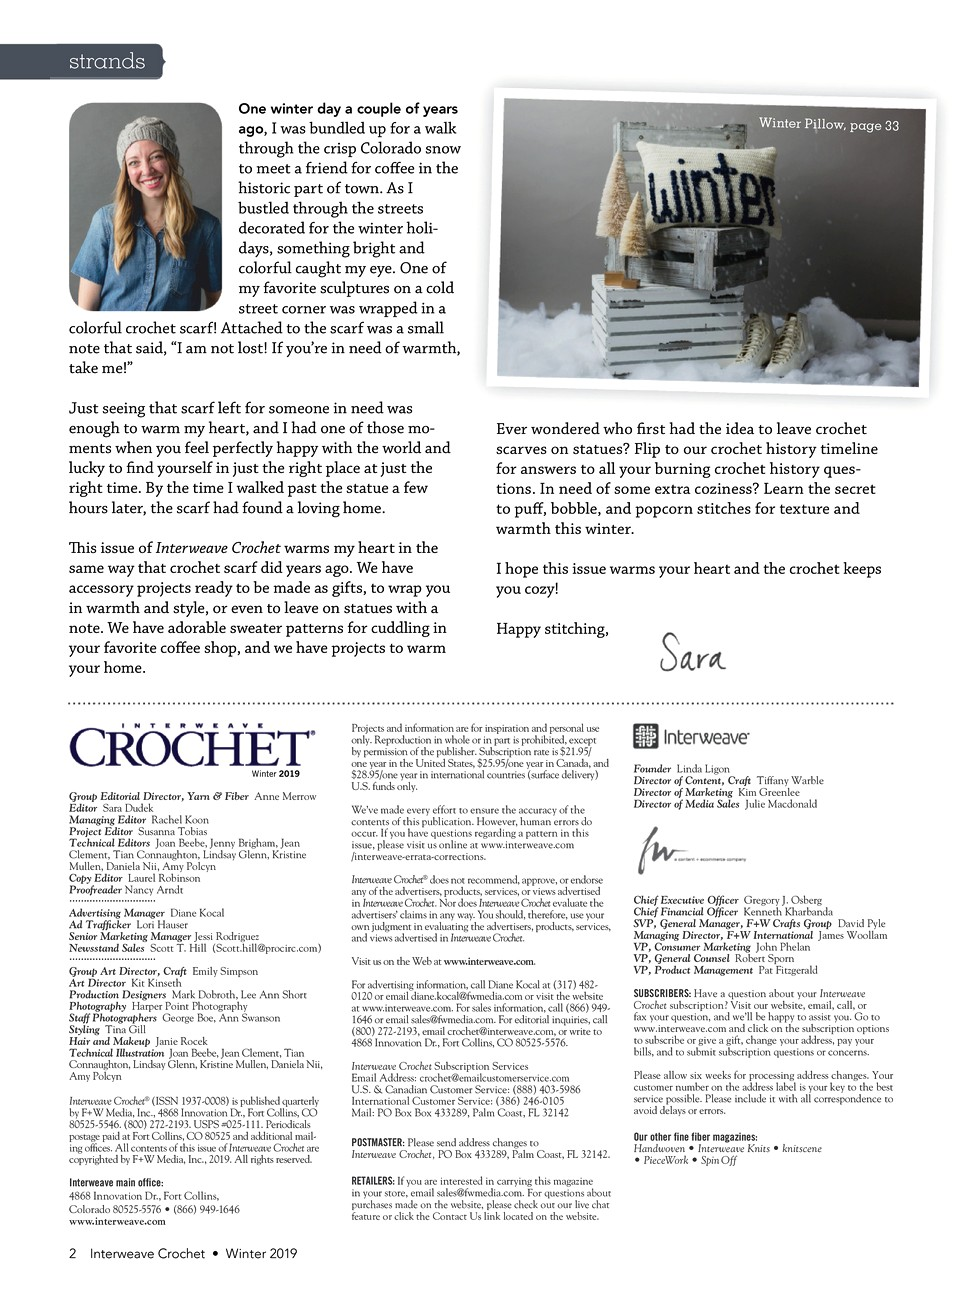 Interweave Crochet Winter 2019-03